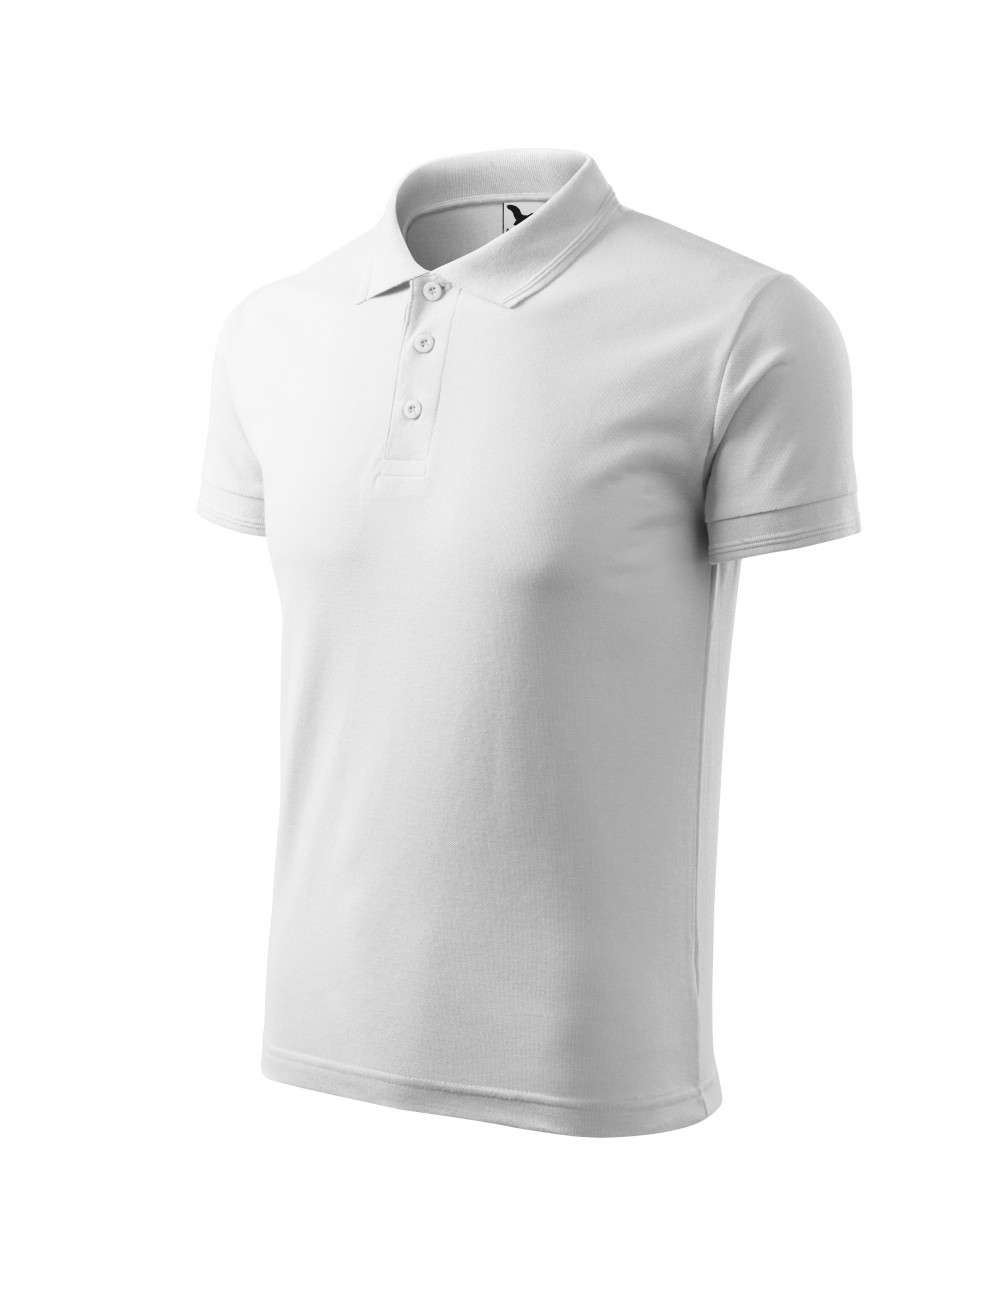 Adler MALFINI Koszulka polo męska Pique Polo 203 biały